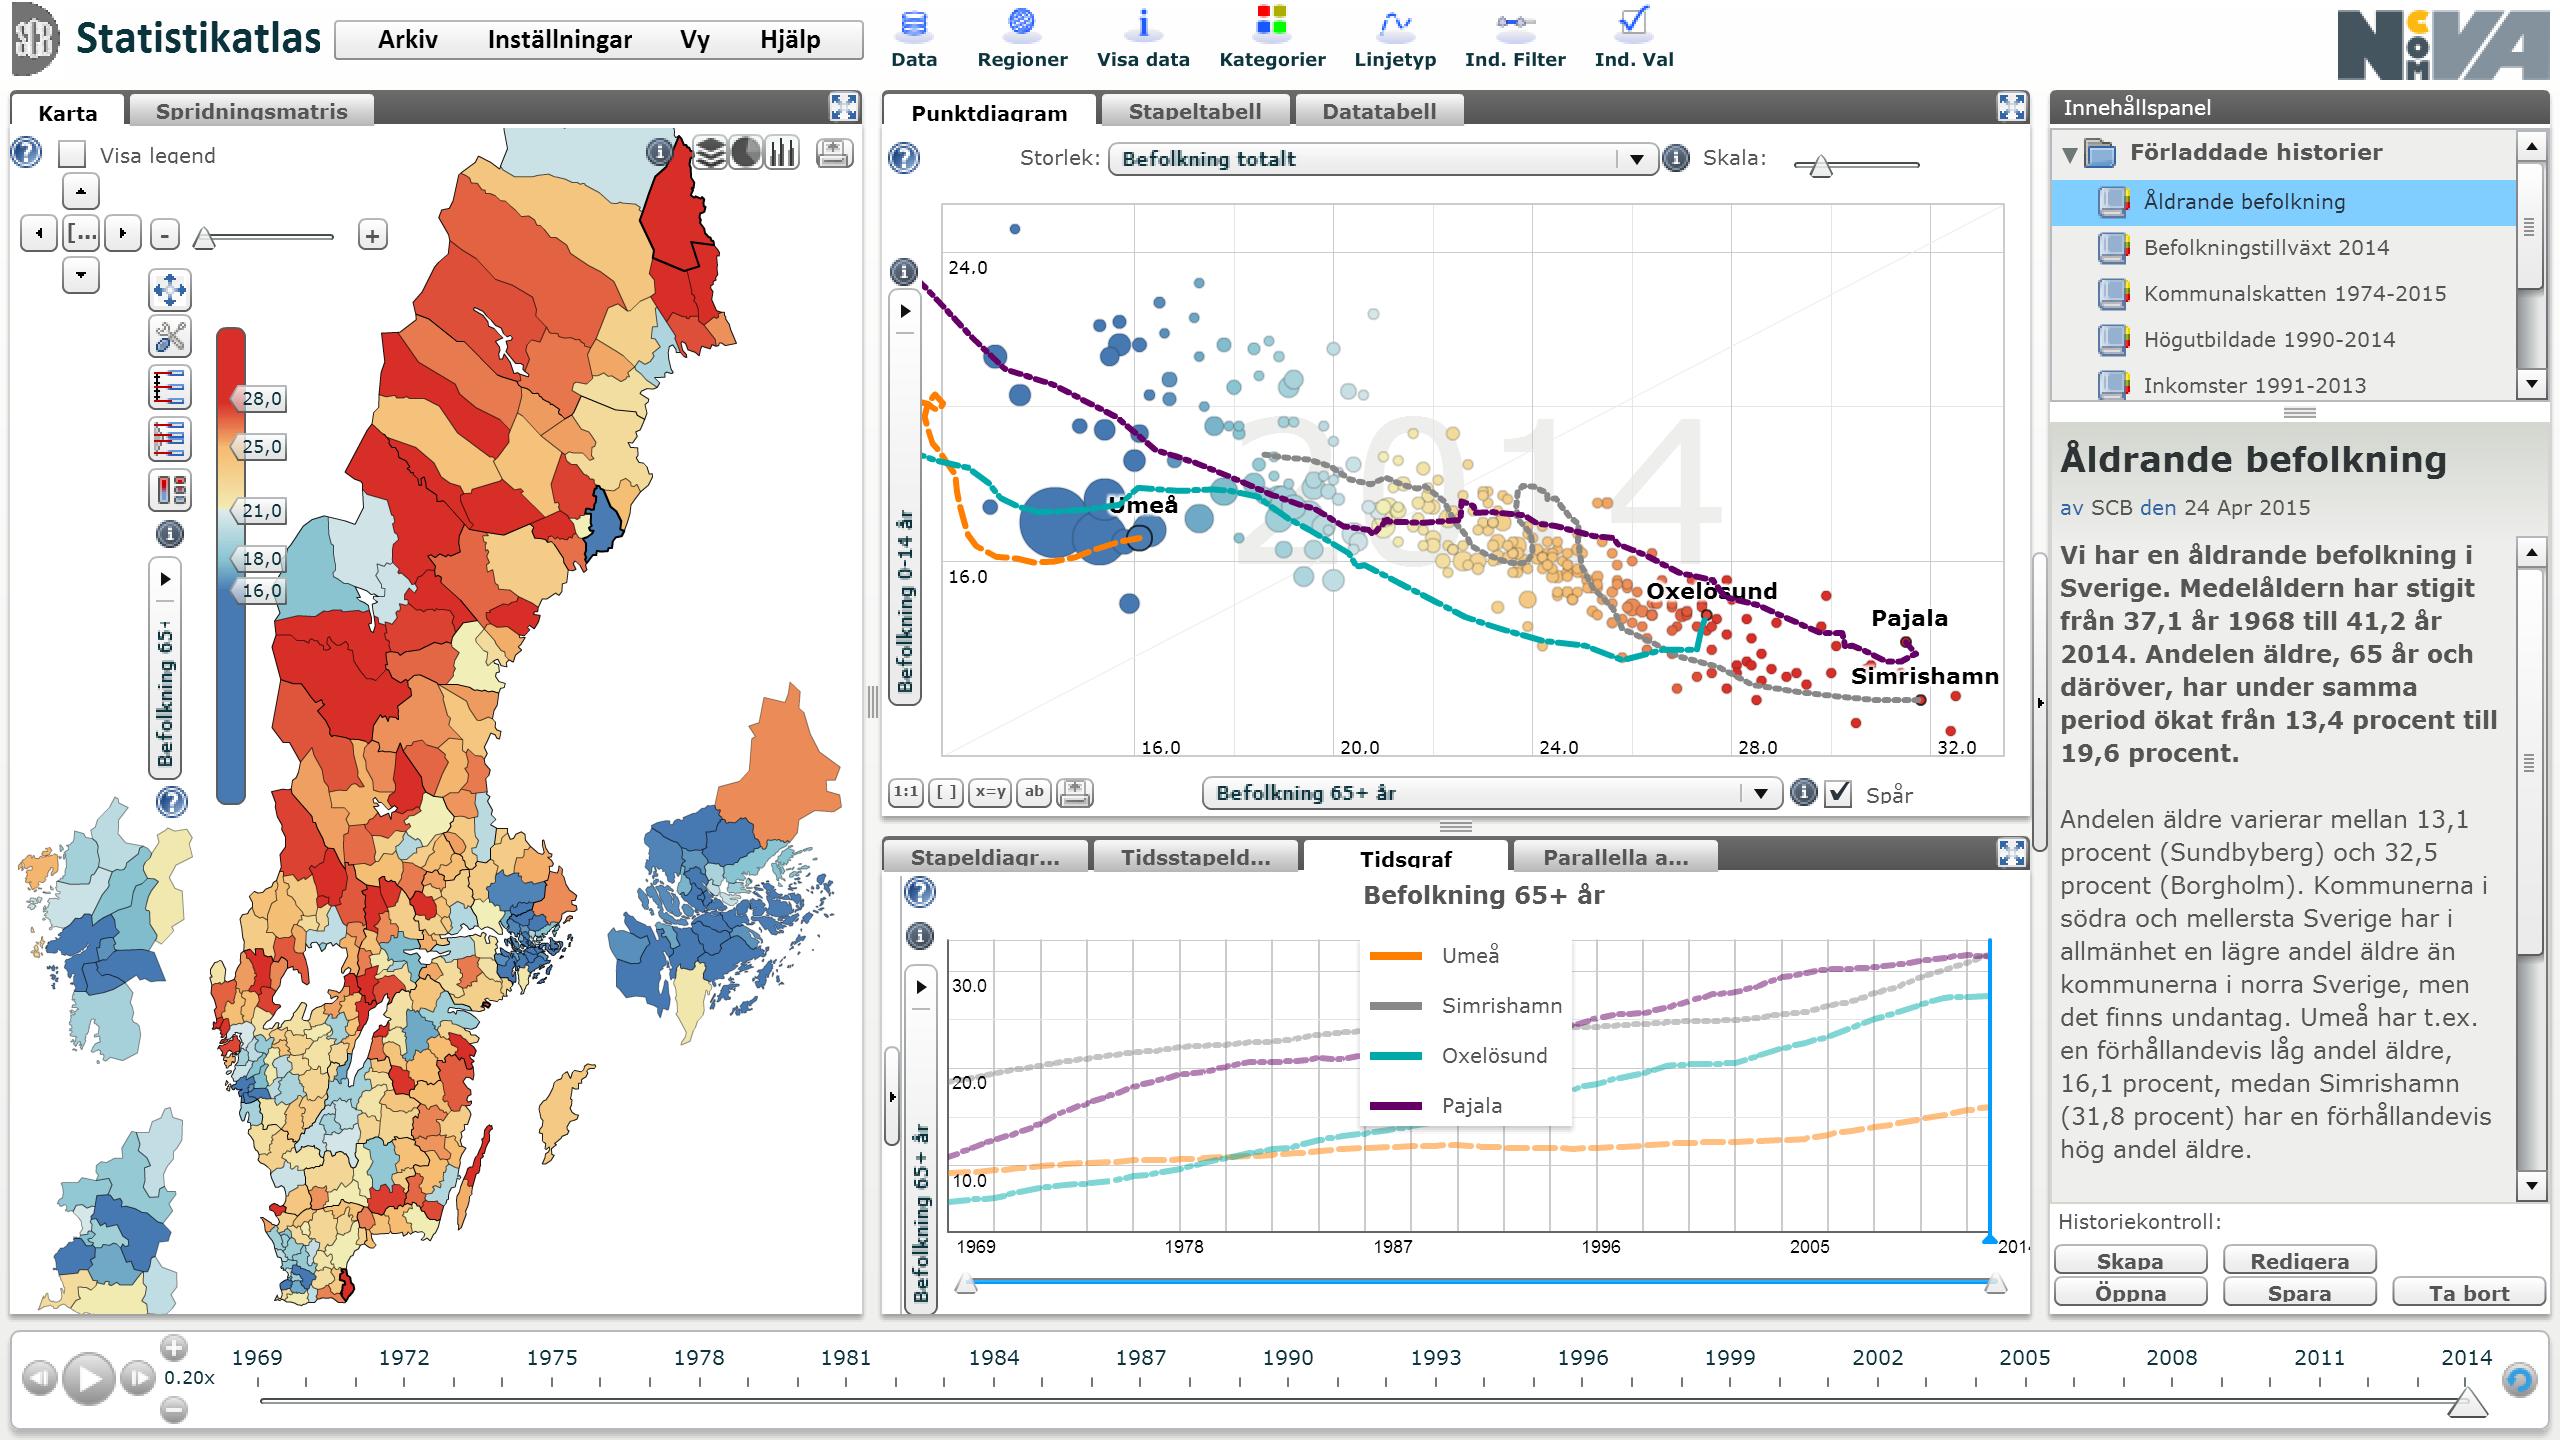 Statistics sweden scb great statistics visualization ncvanu scb ldrande befolkning ccuart Images